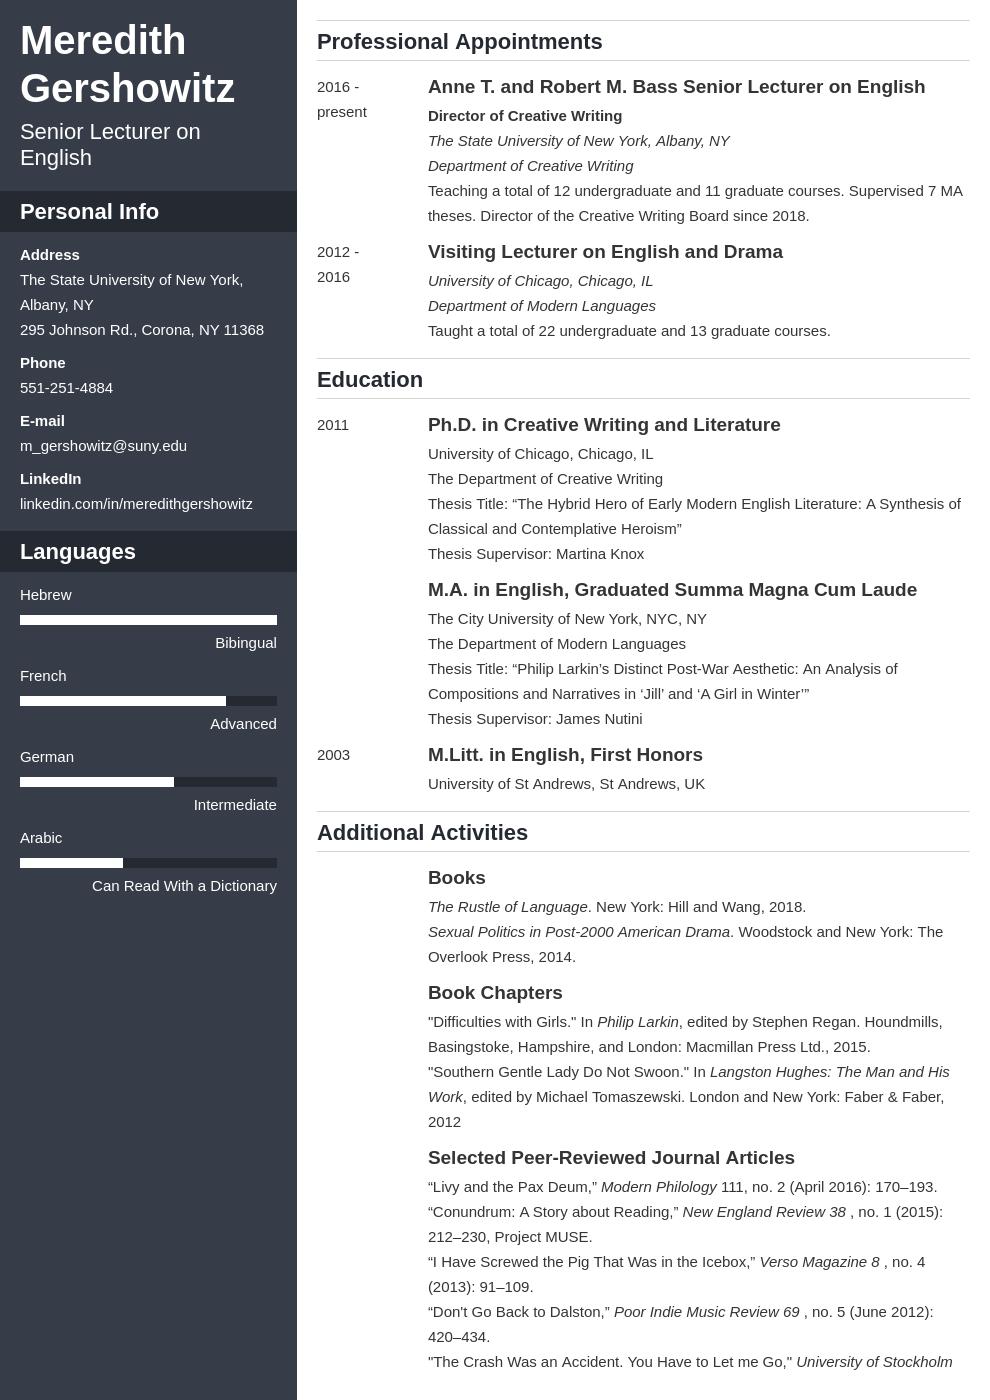 cv academic template cascade uk